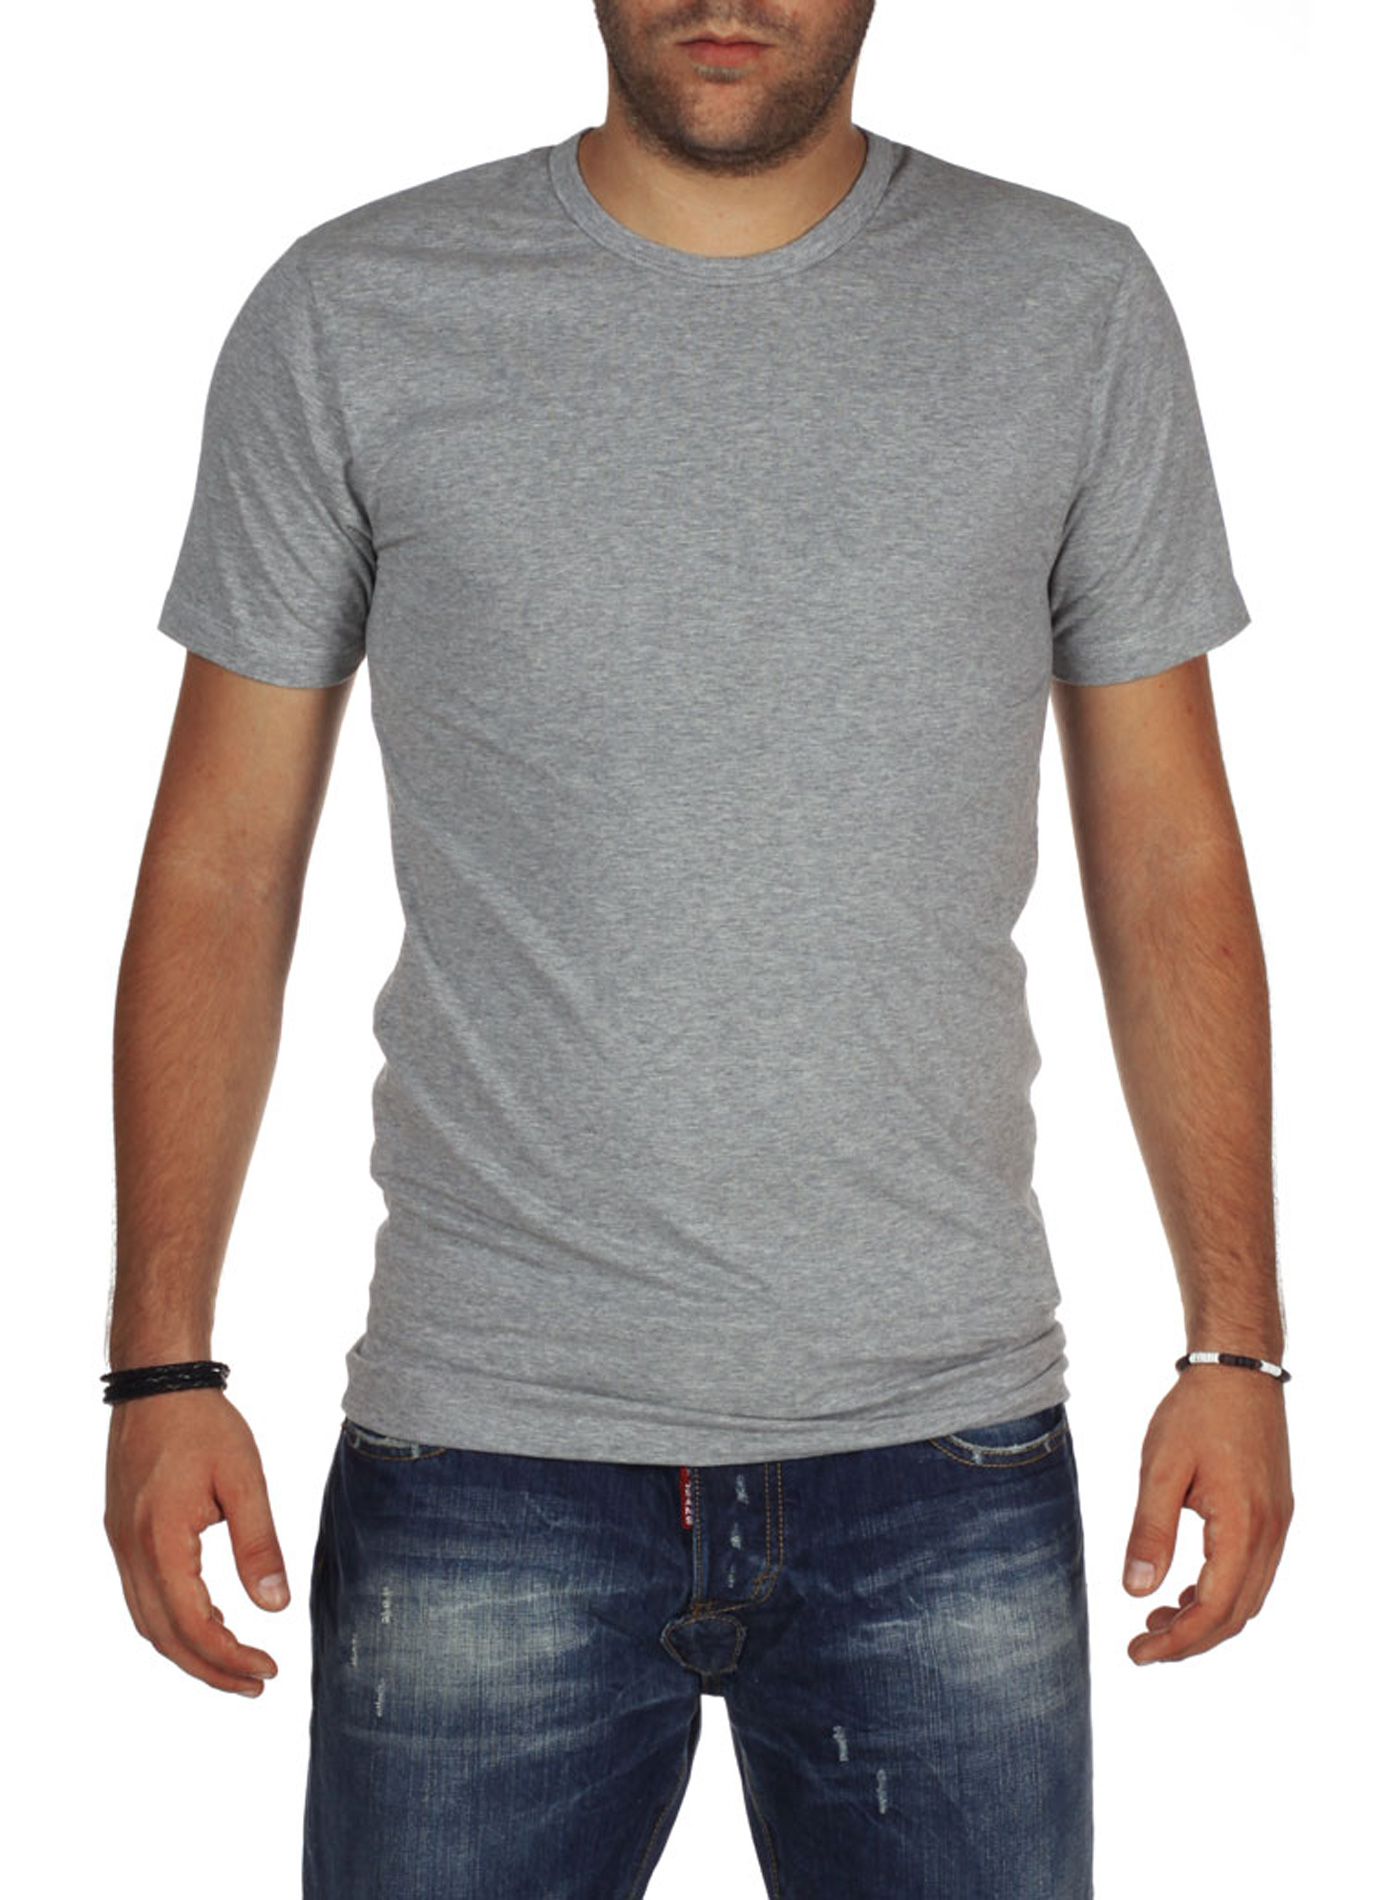 Gray Shirt Model Gray t Shirt t